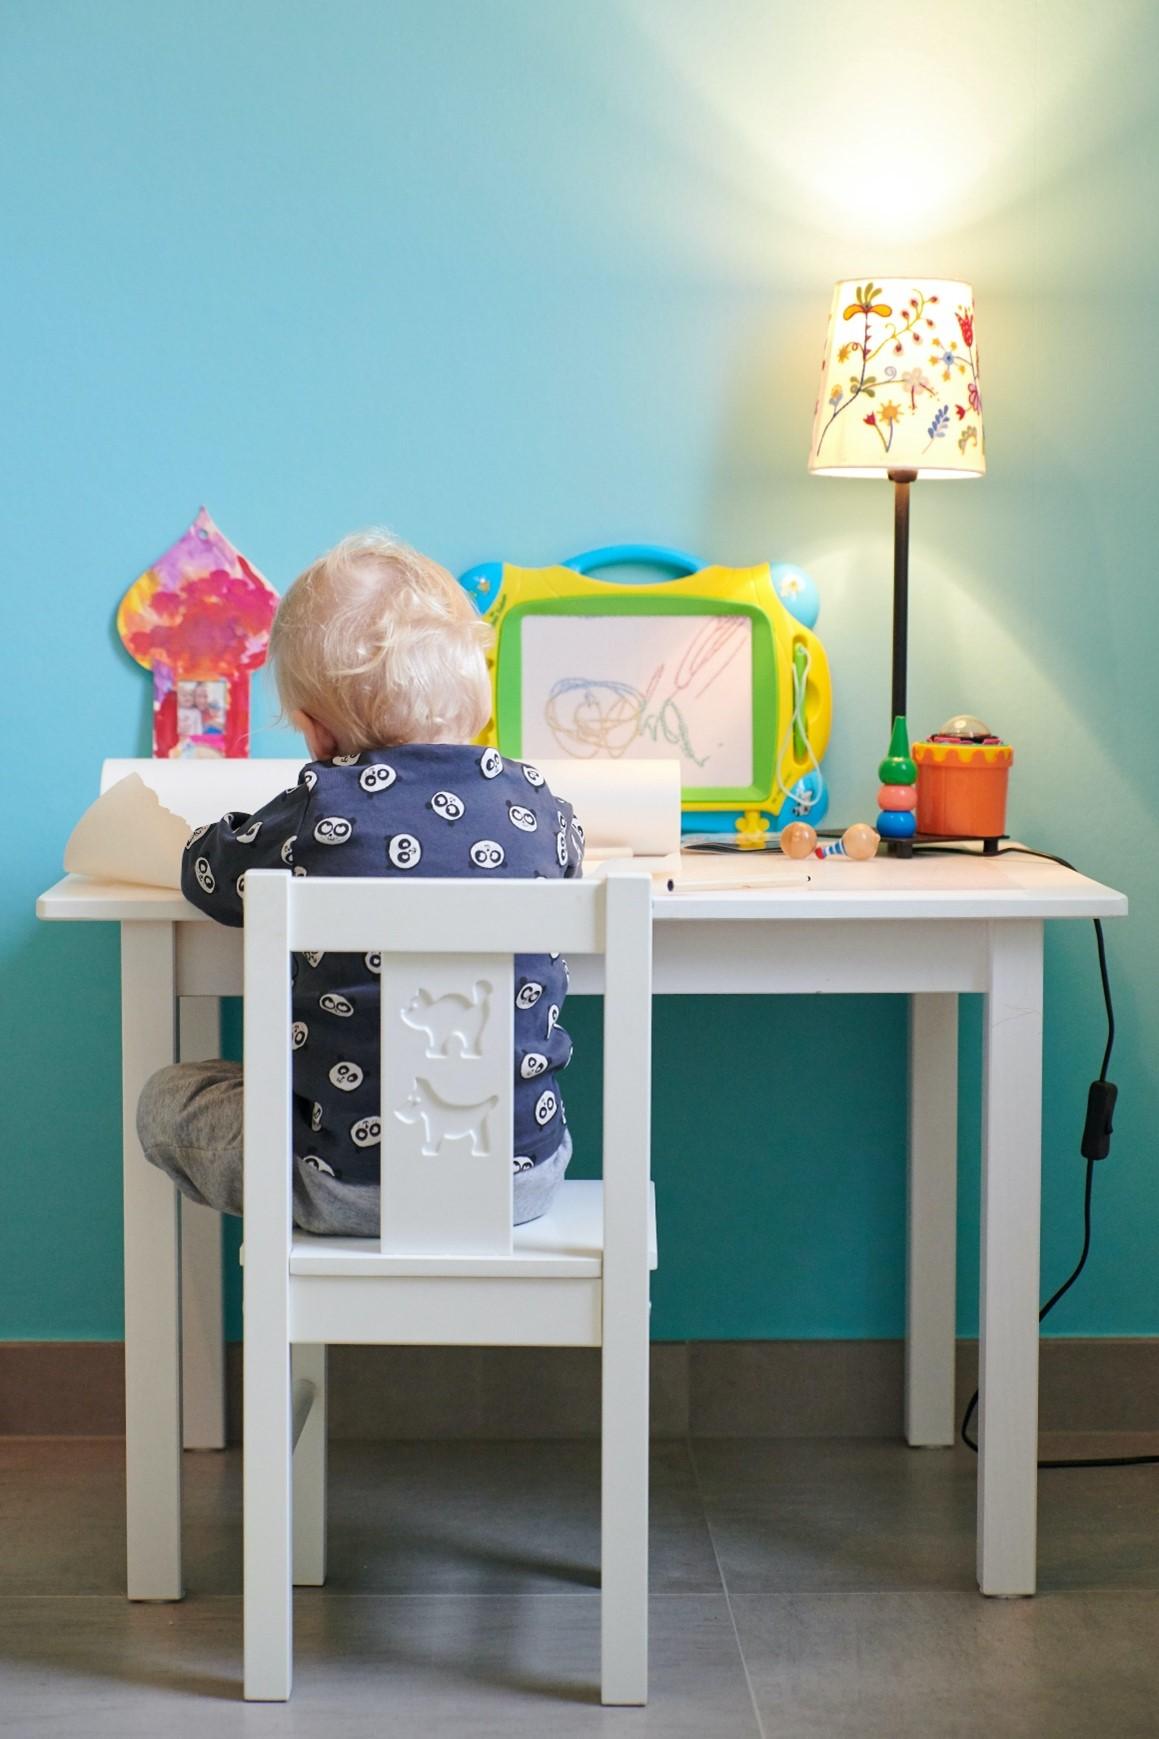 clutter-free desk space